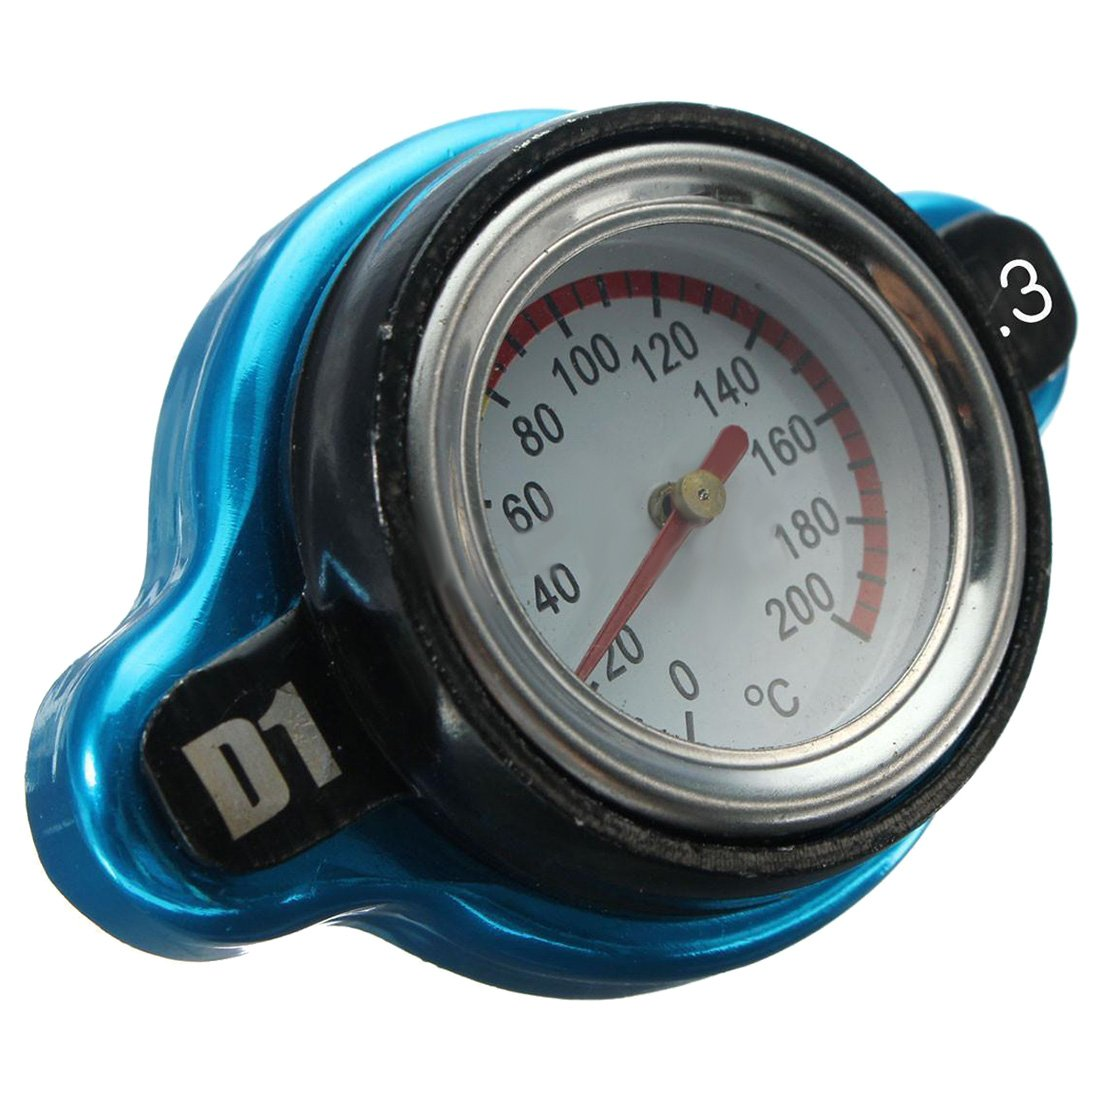 SODIAL(R) Universal Car 1.3 Bar Thermostatic Radiator Cap Cover Water Temperature Gauge 101161